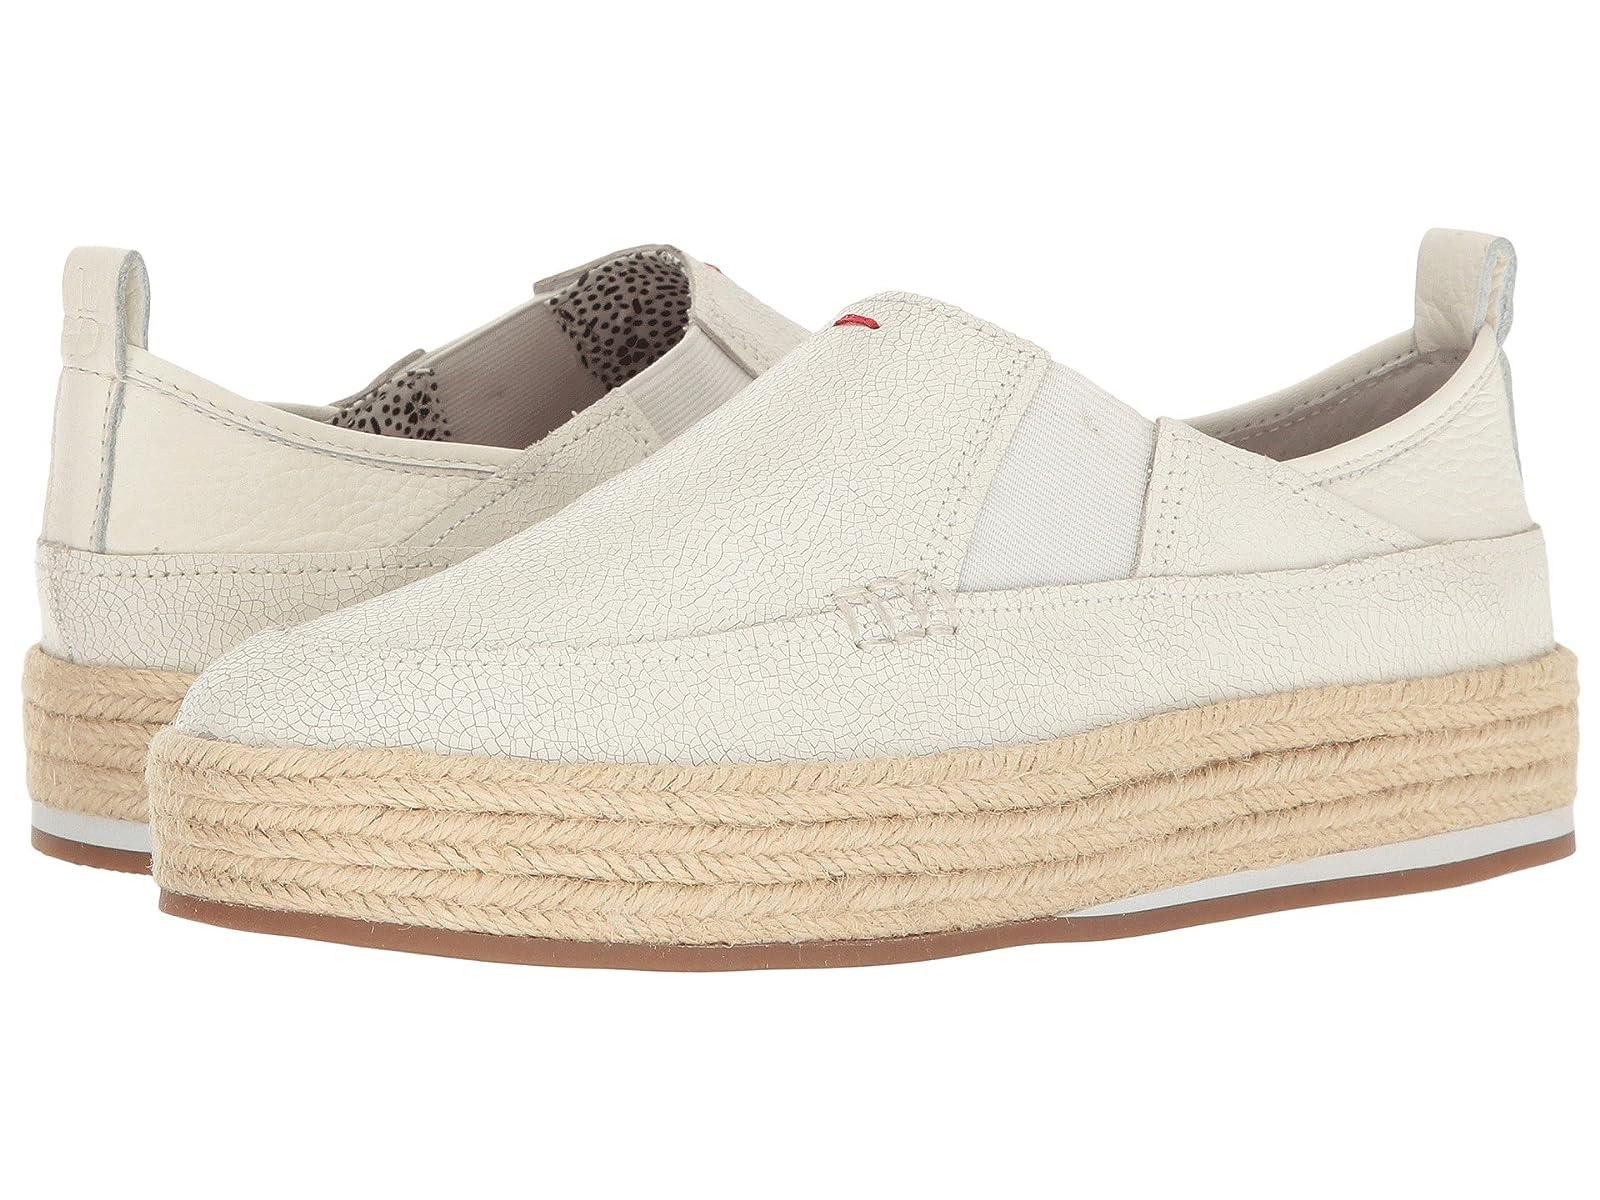 ED Ellen DeGeneres GaranceCheap and distinctive eye-catching shoes